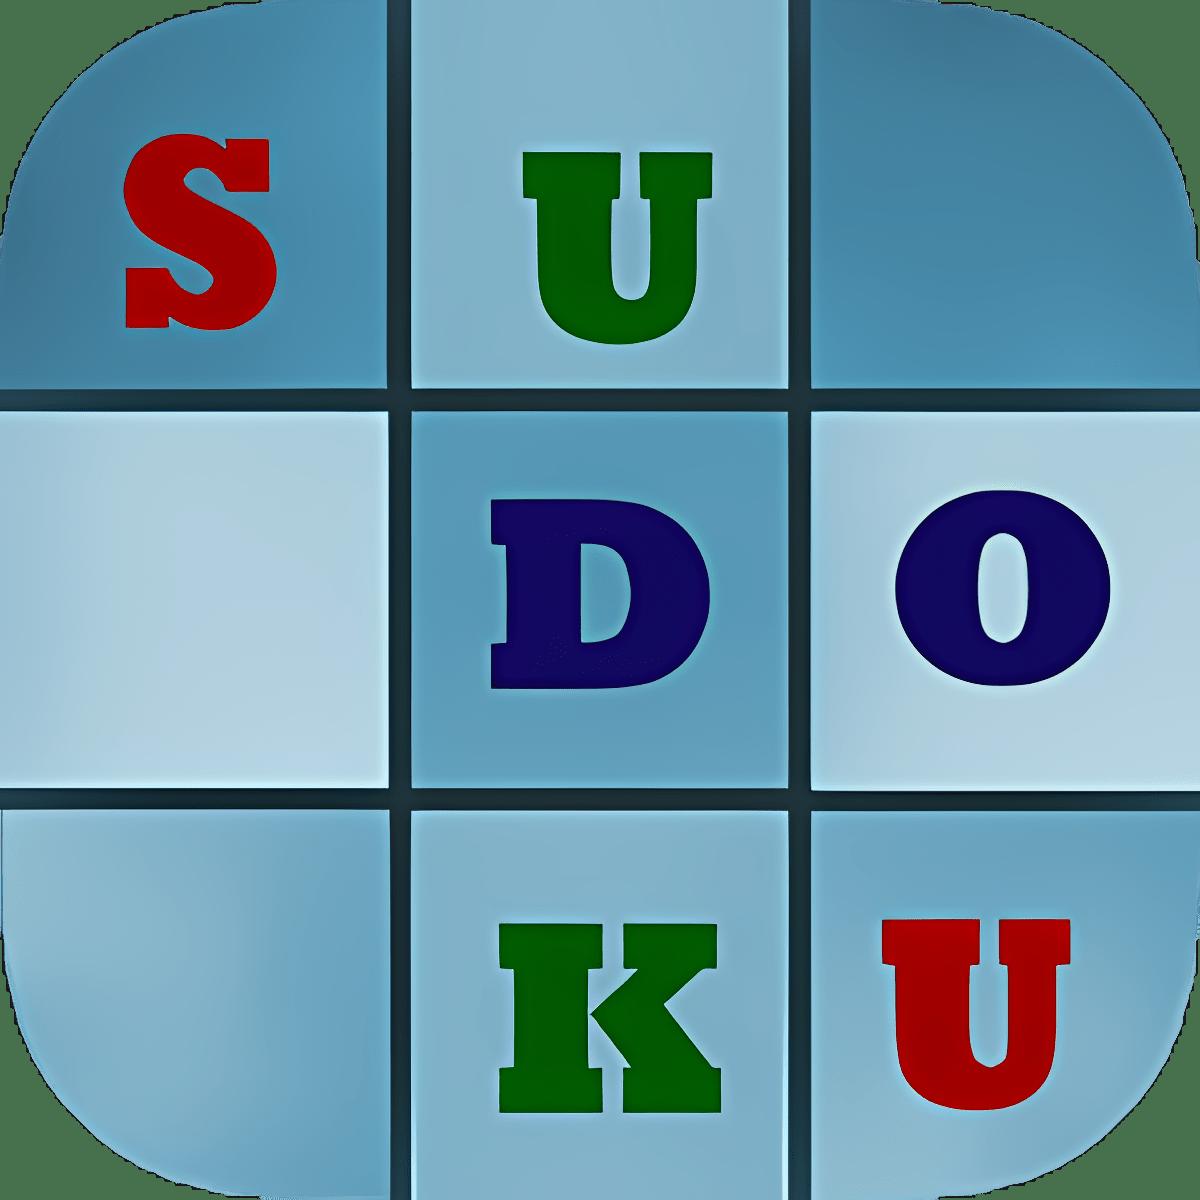 Classic Sudoku premiumAd free